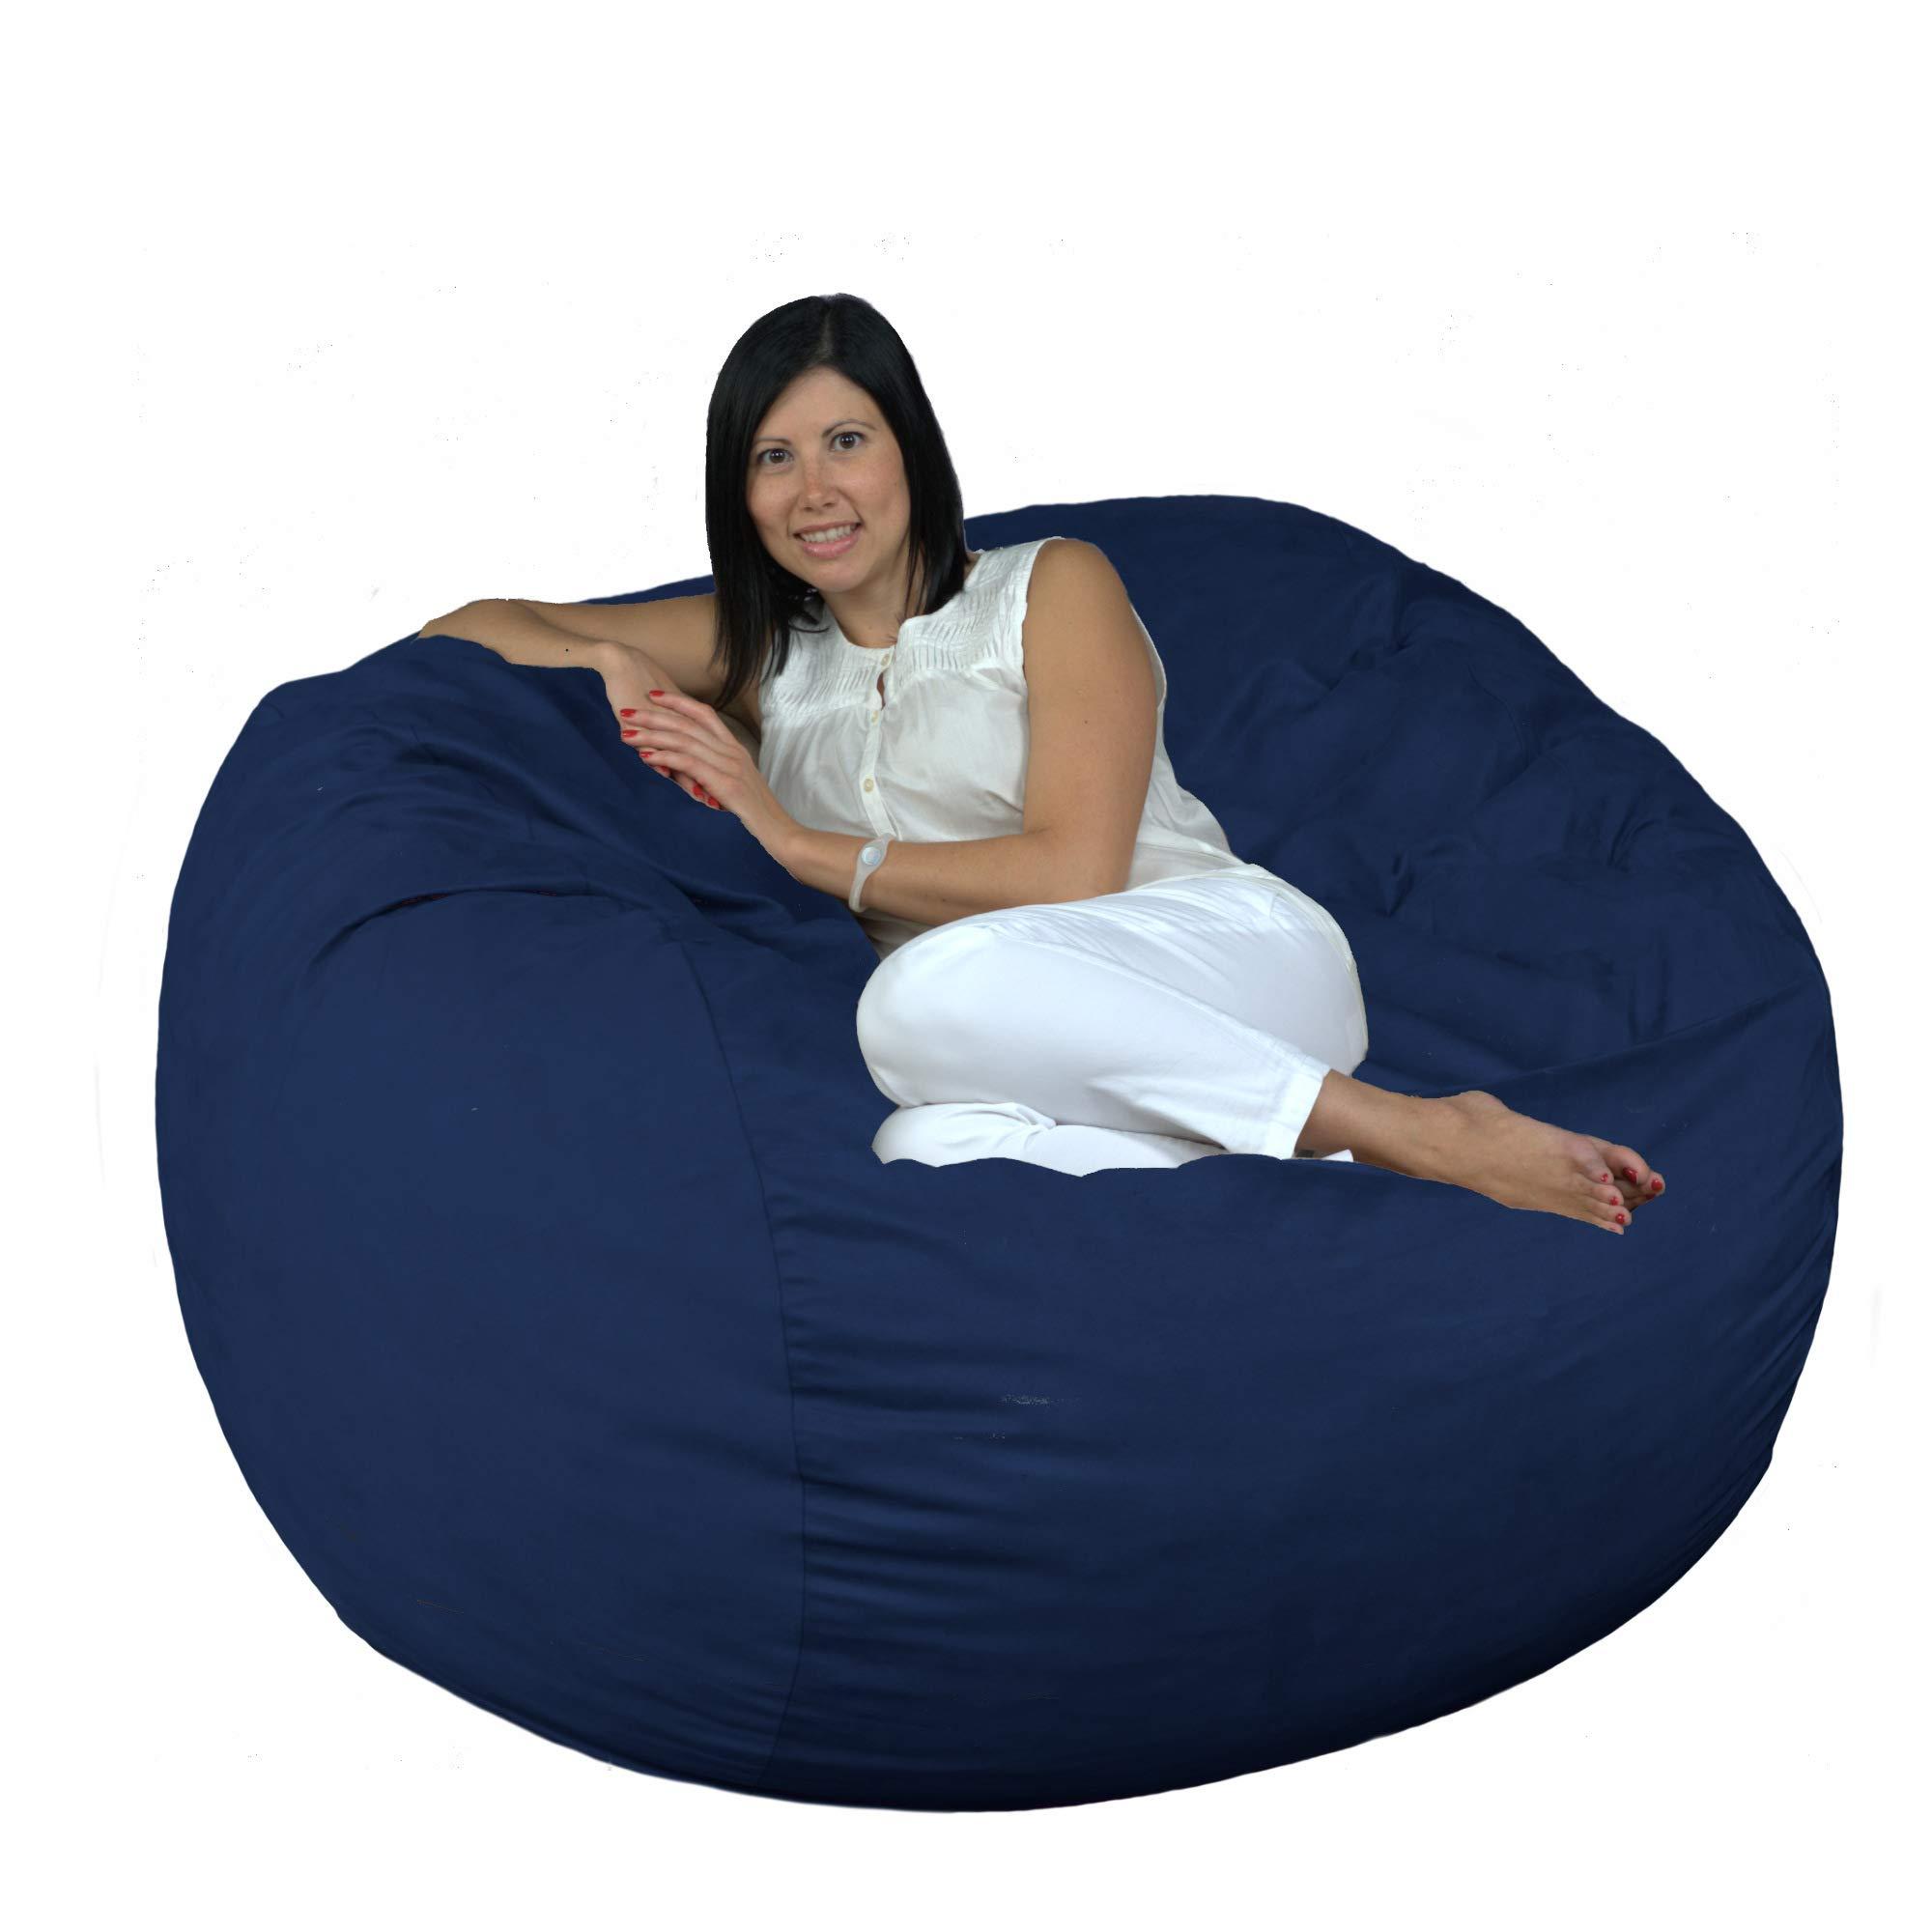 FUGU Bean Bag Chair, Premium Foam Filled 4 XL, Protective Liner Plus Removable Machine Wash Navy Blue Cover by FUGU